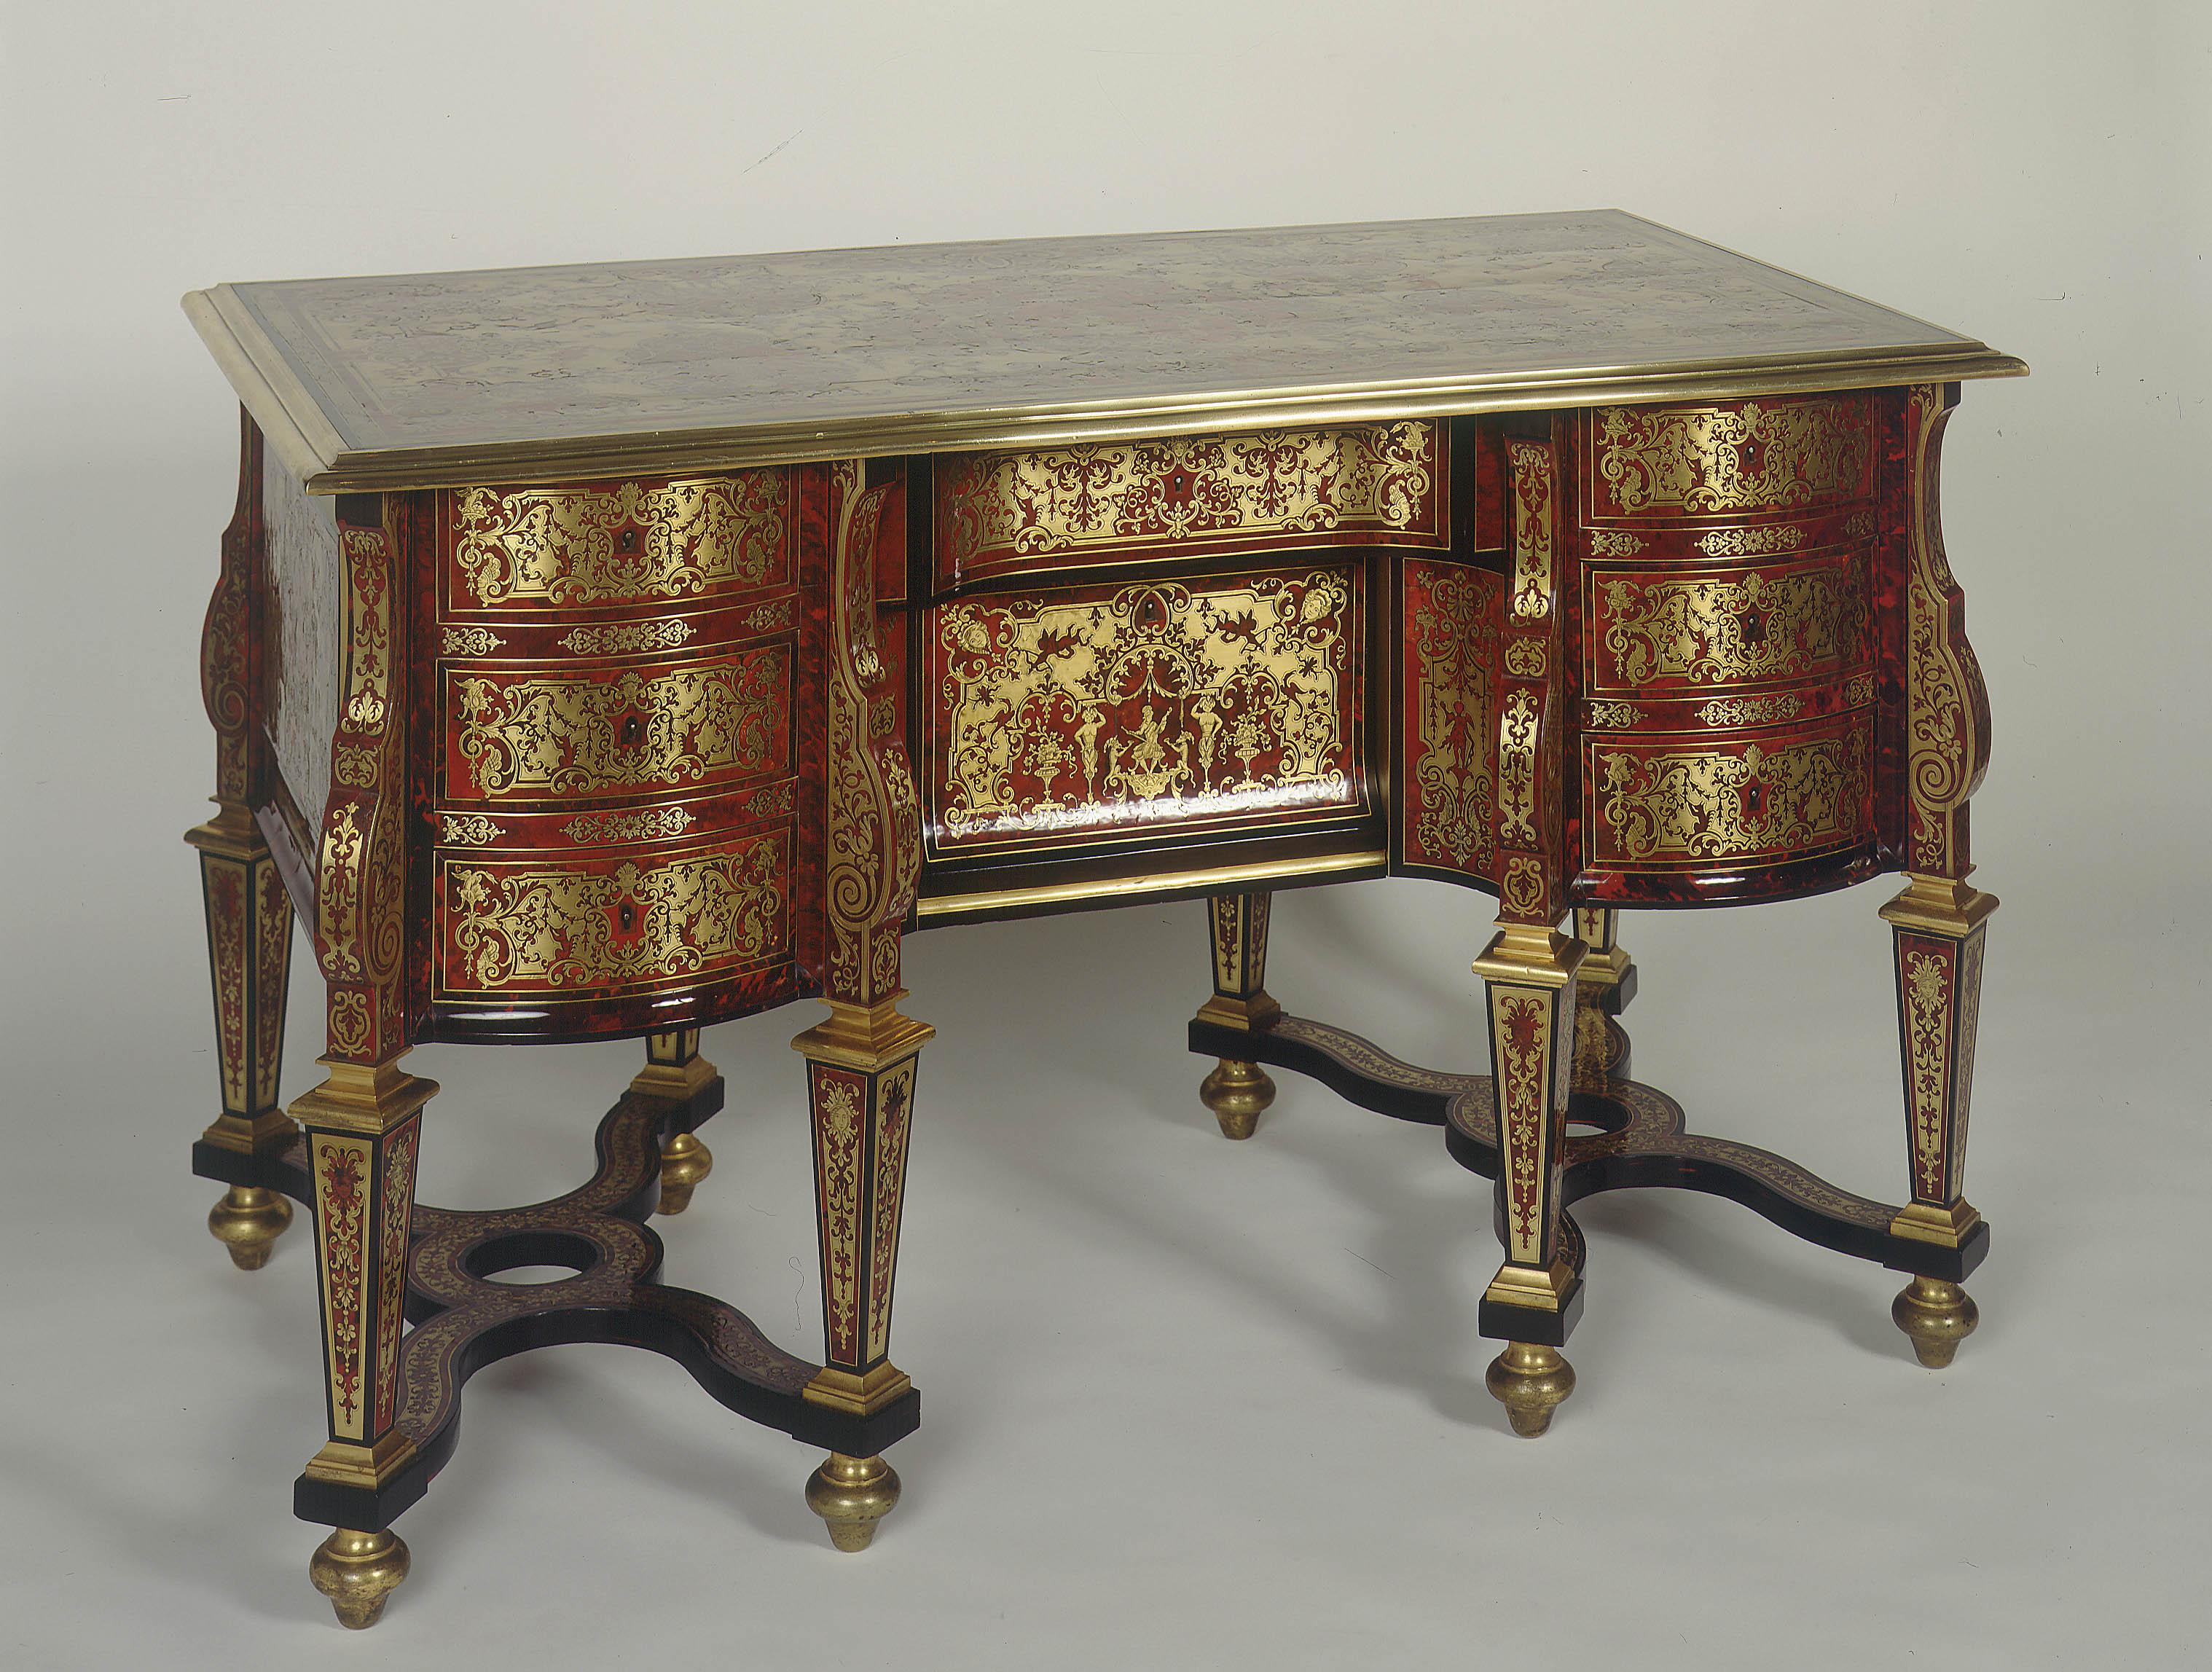 Nicolas Sageot - Mazarin table desk